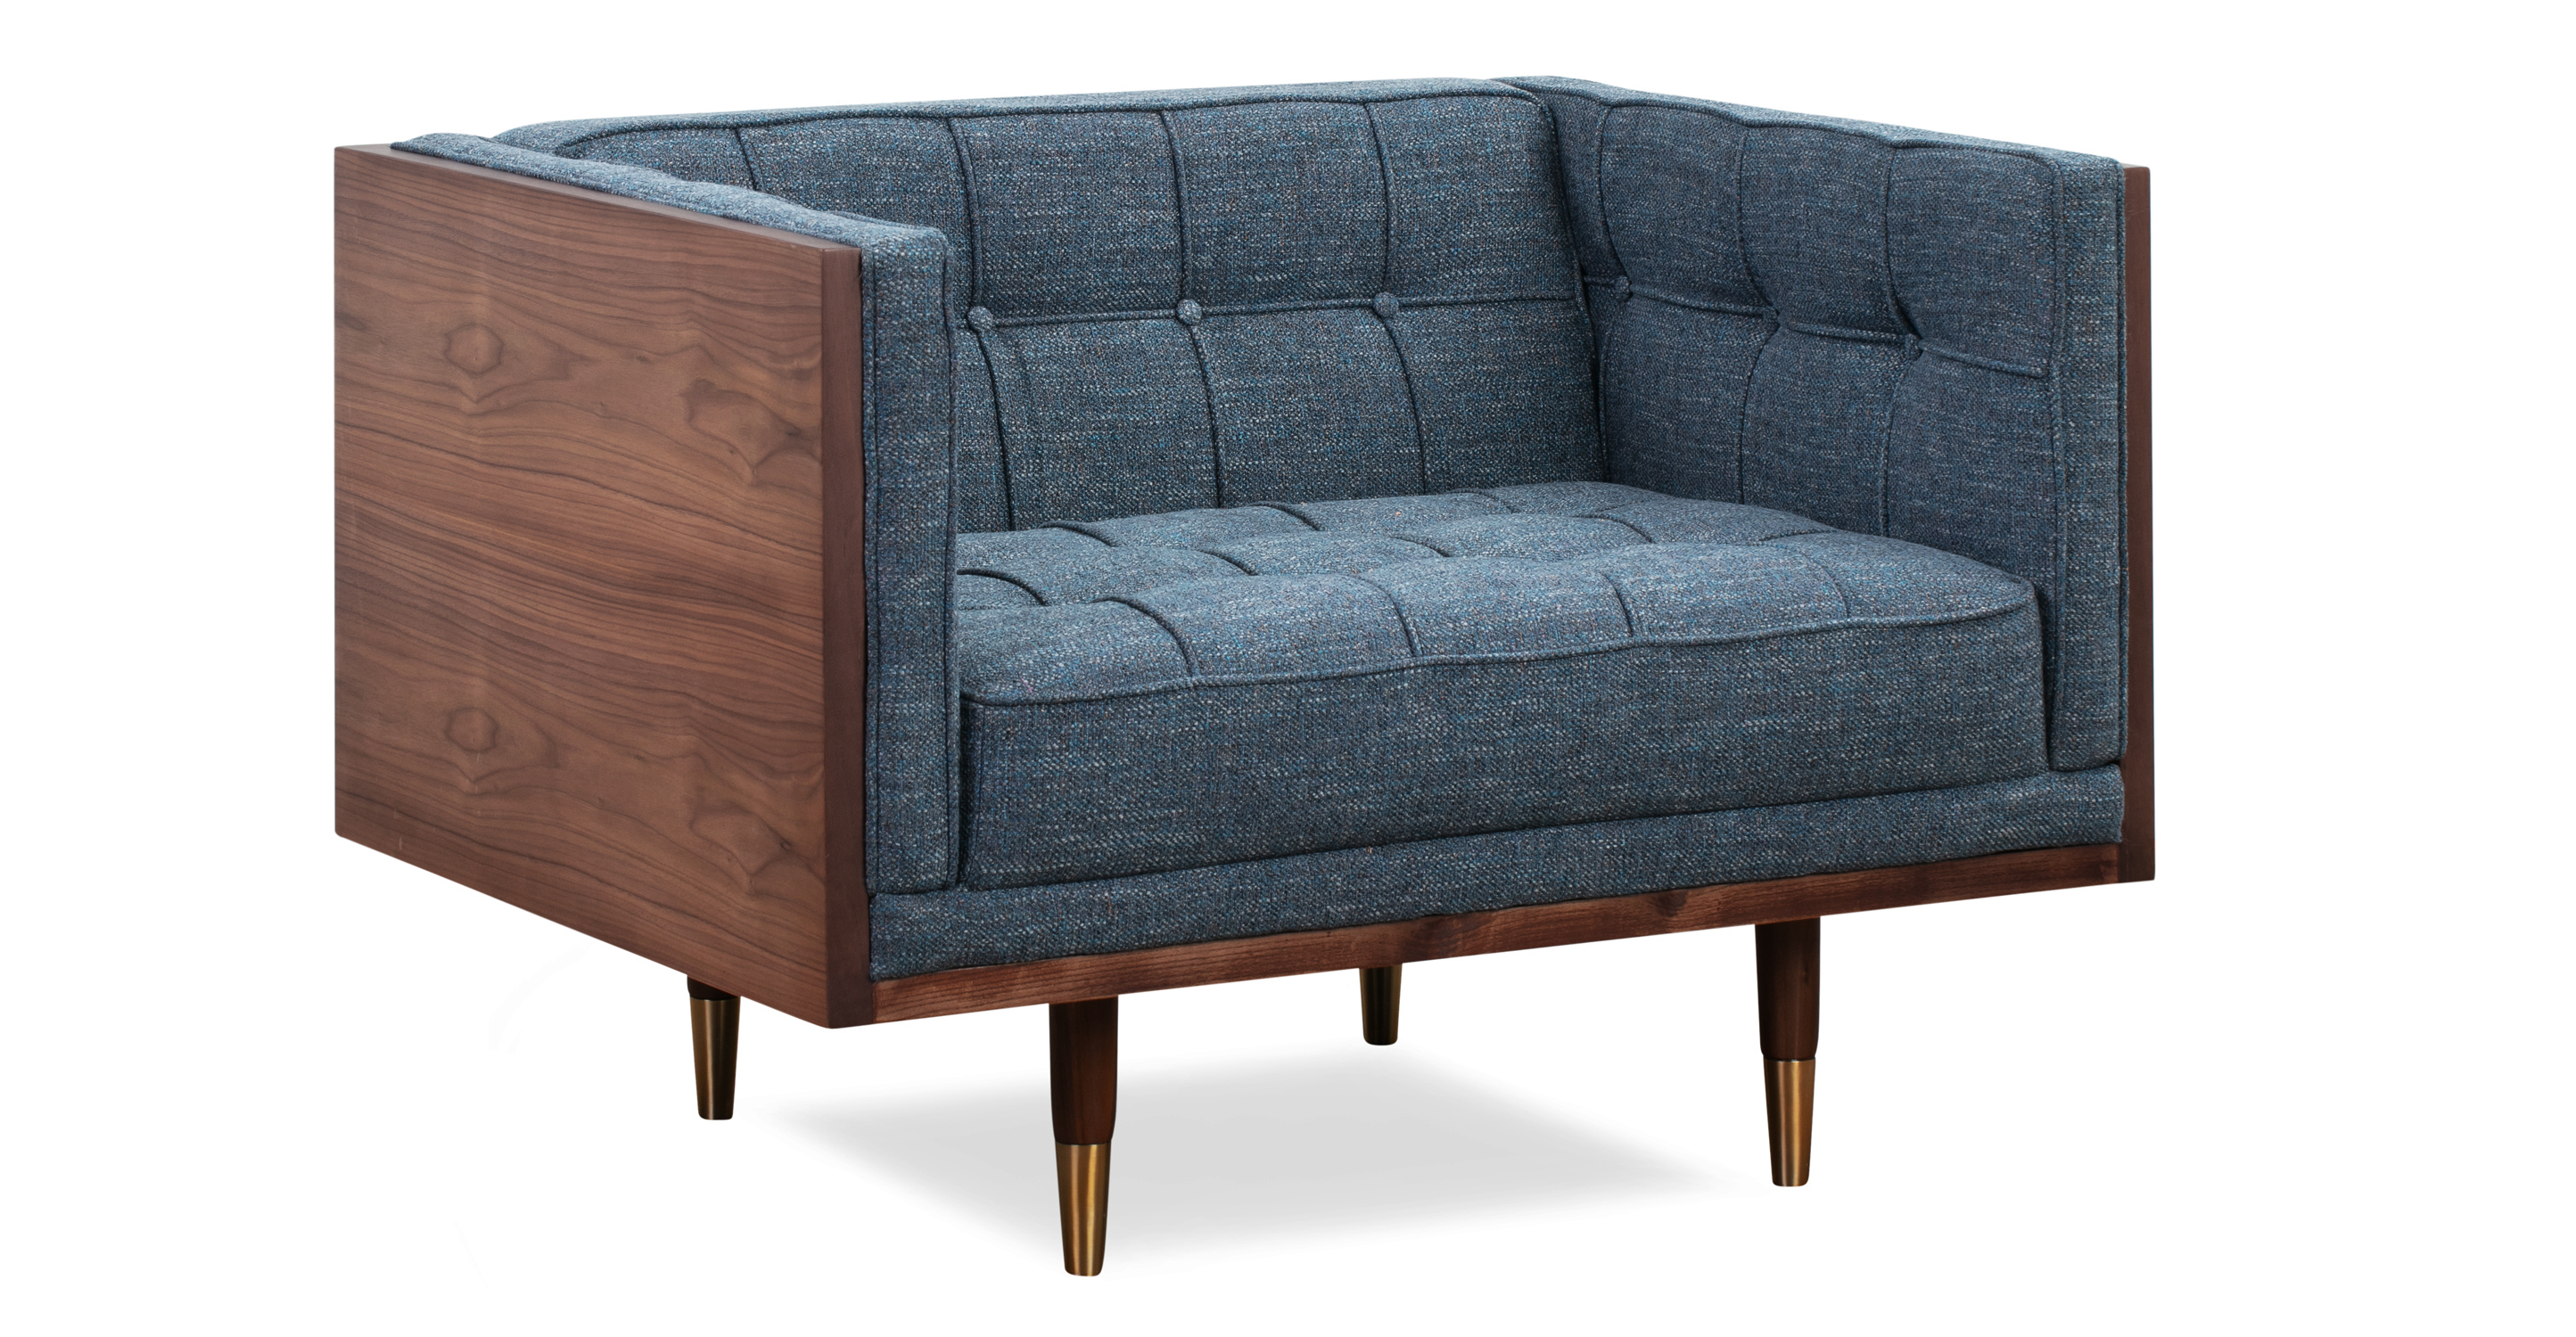 Woodrow Box Fabric Chair, Walnut/Jagar